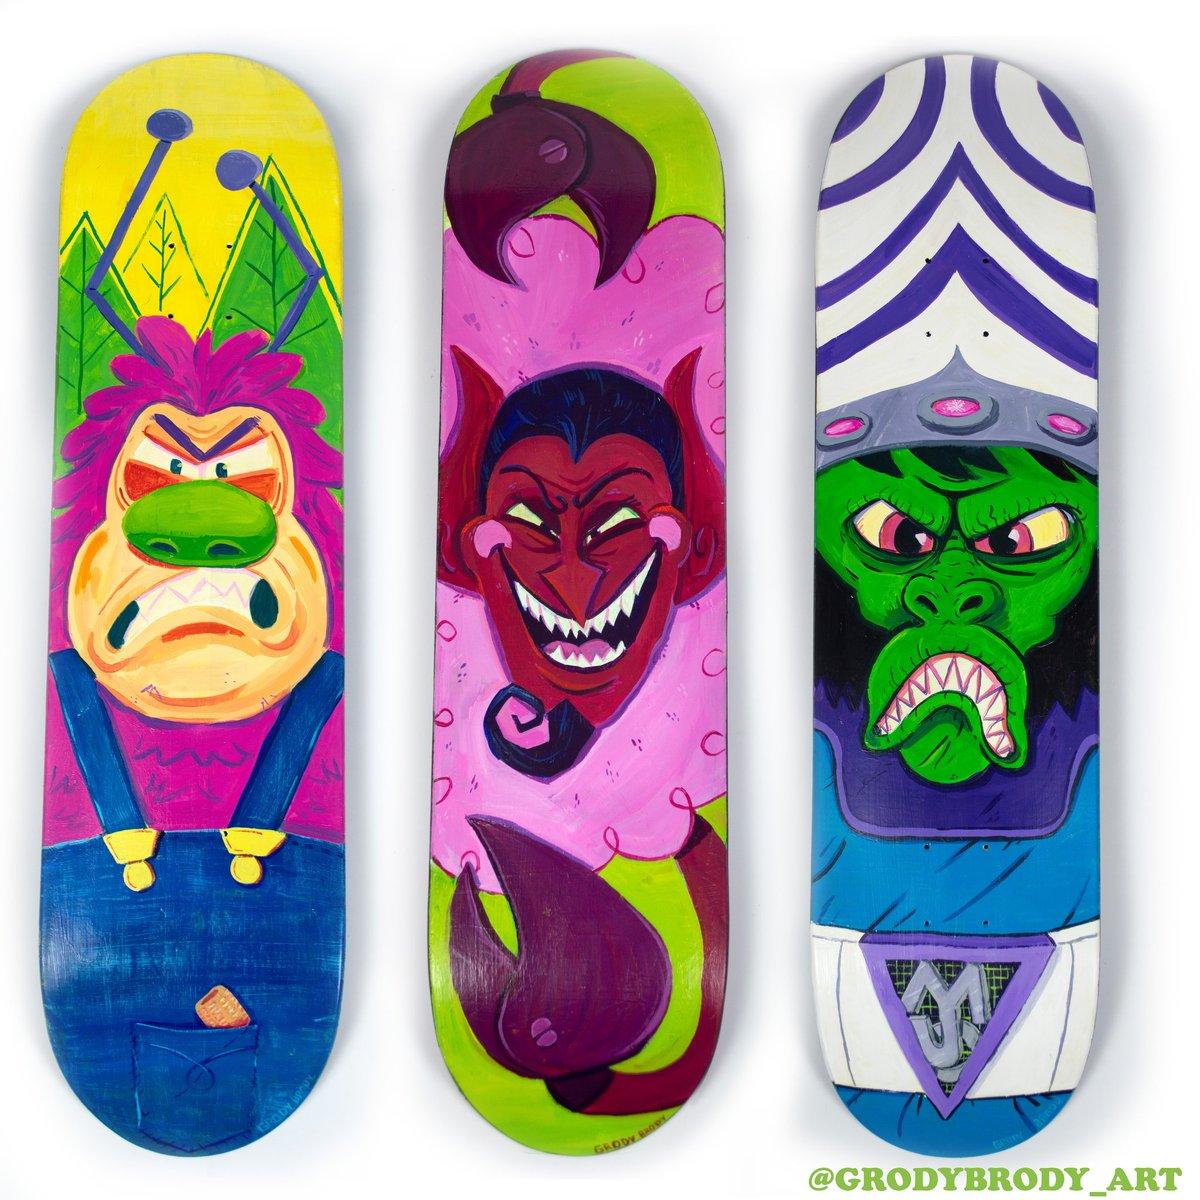 Finally finished my painting my #PowerpuffGirls skateboards!  #fridaymorning #customskate #ArtistOnTwitter #fanart #meme